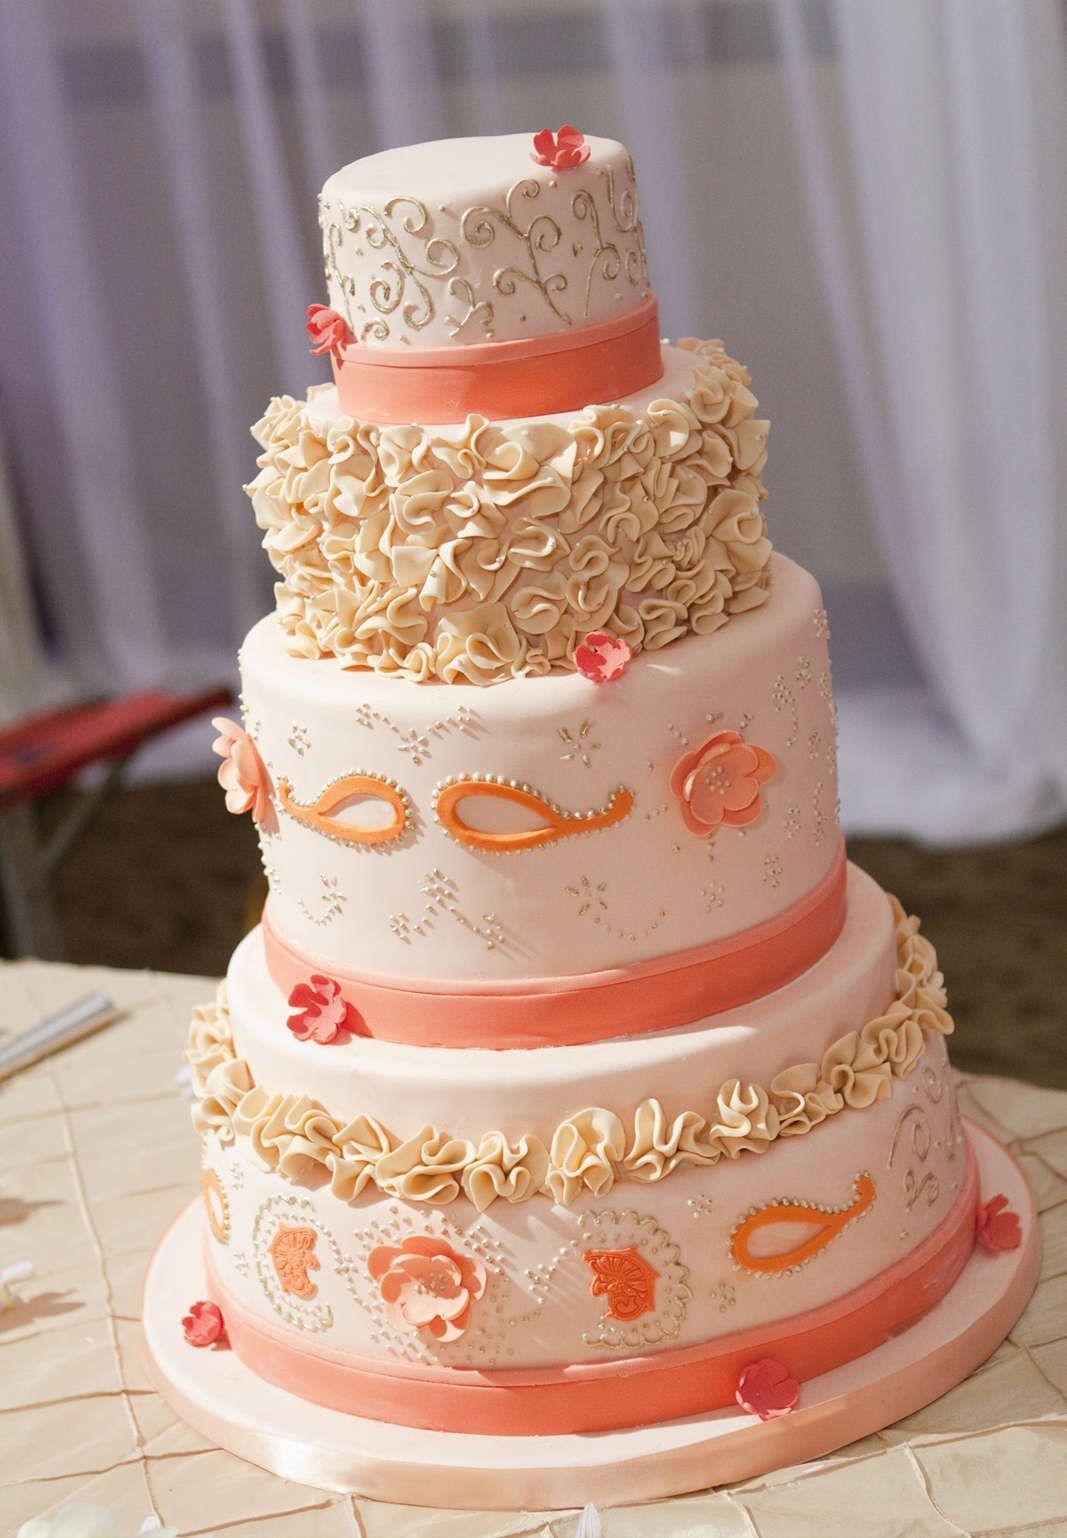 Cake boss wedding cakes 1080p hd pictures wedding pictures ideas cake boss wedding cakes 1080p hd pictures junglespirit Choice Image